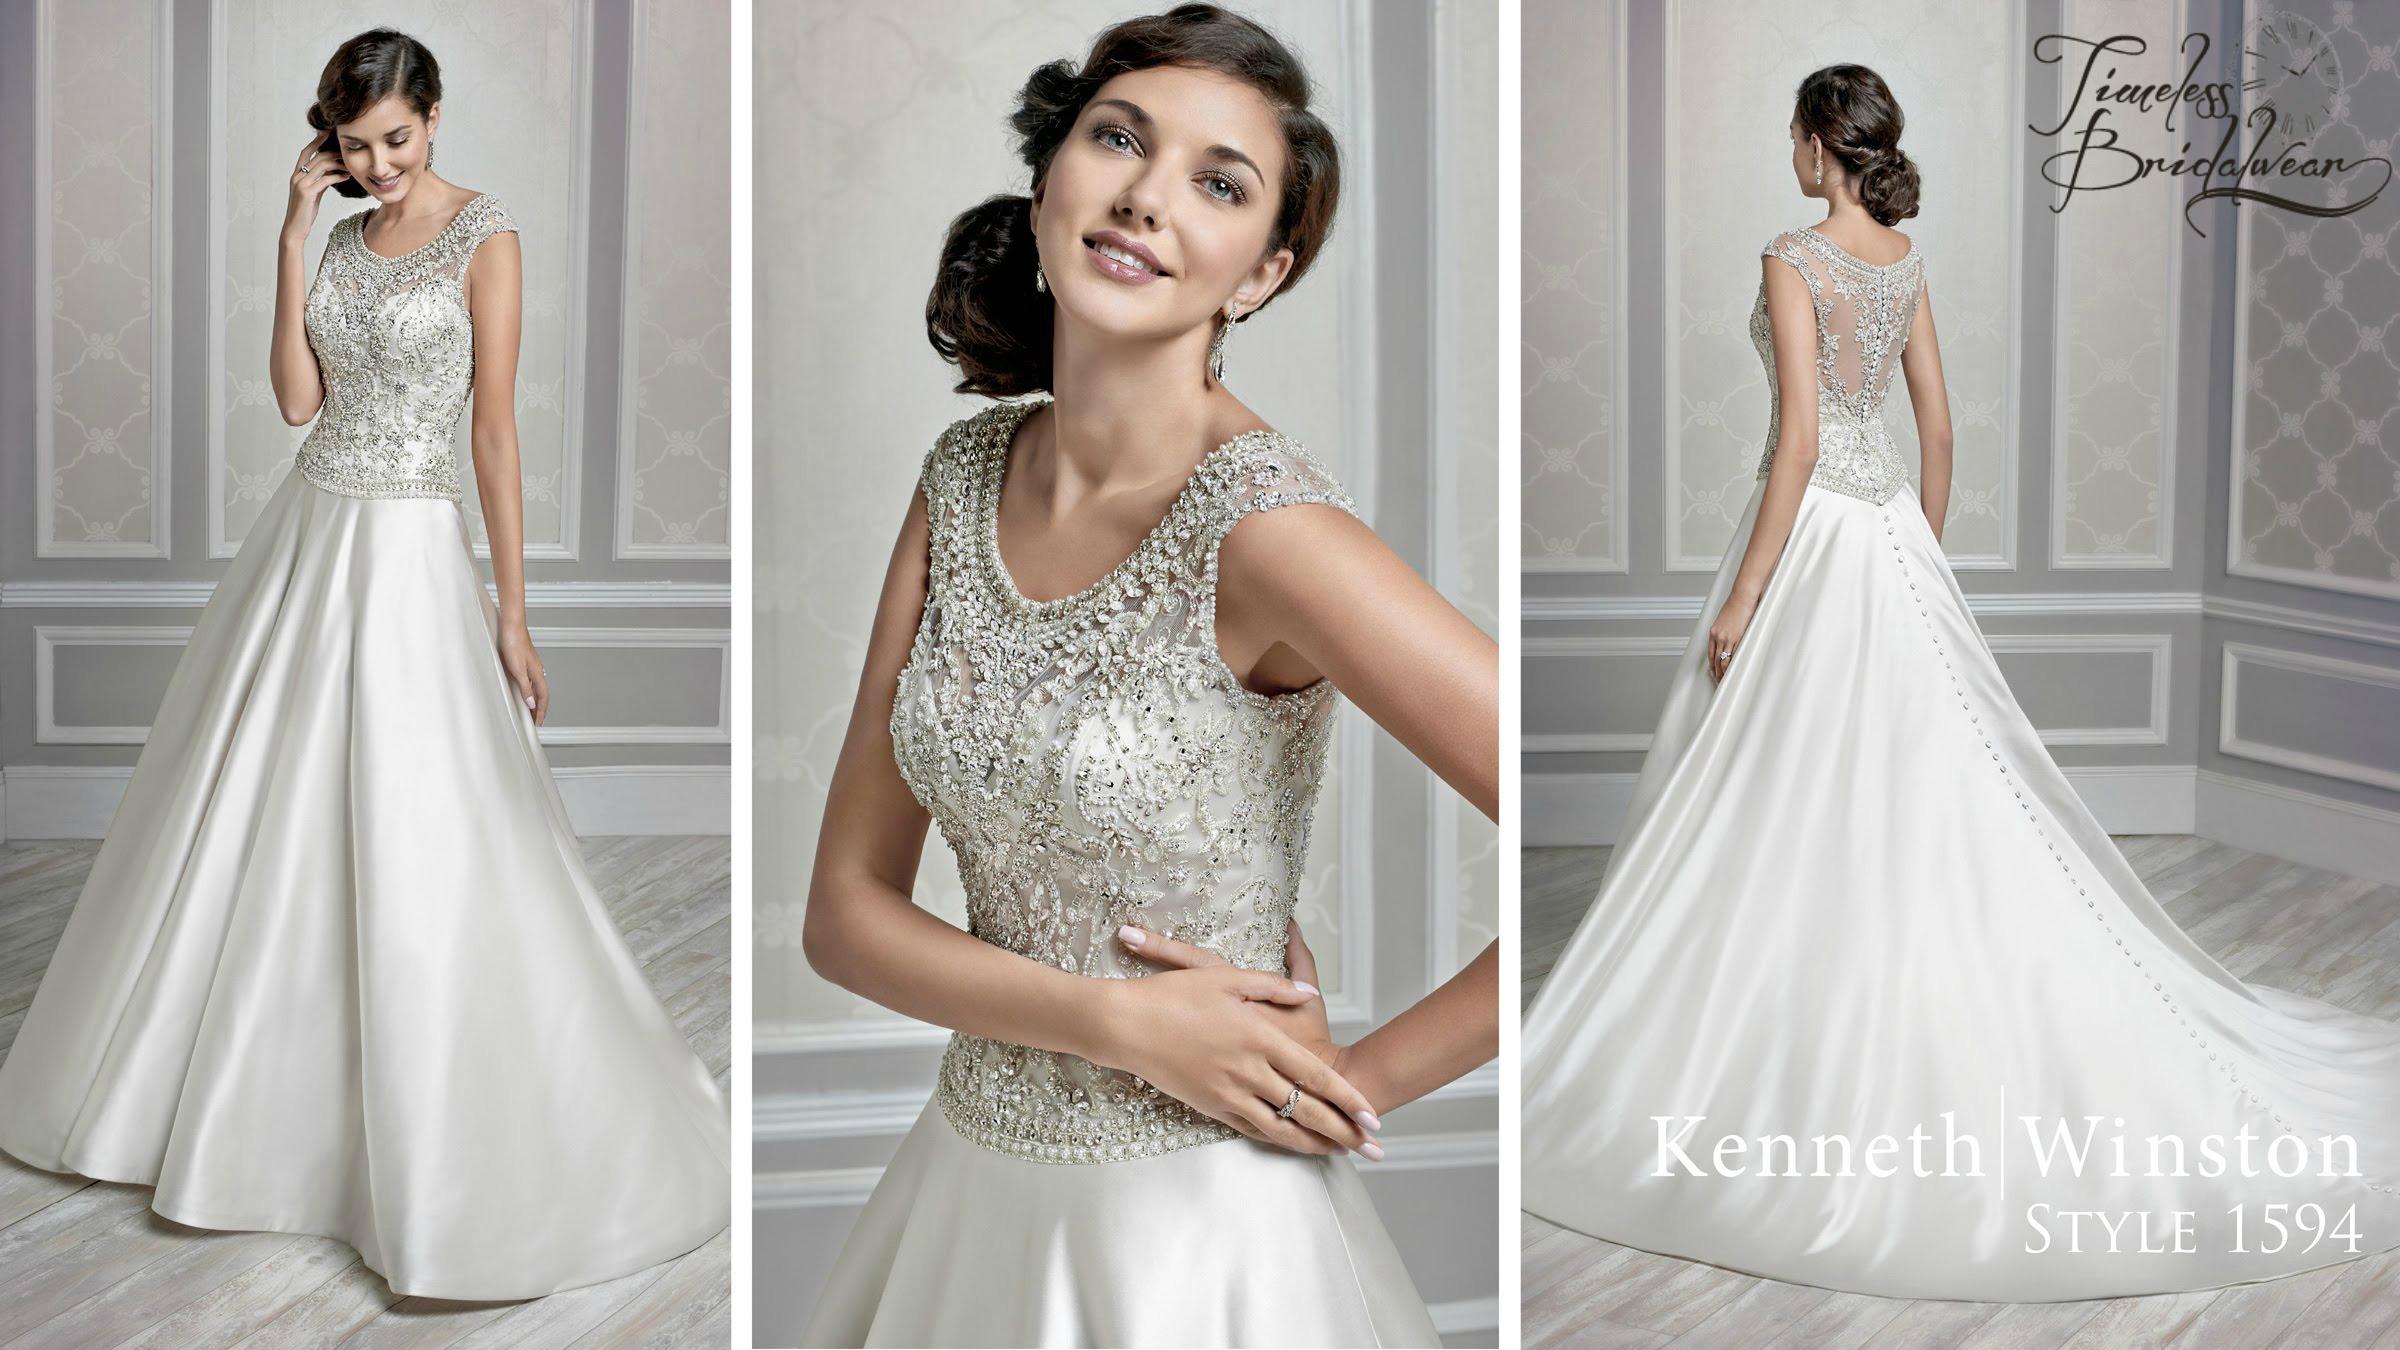 kenneth-winston-ballgown-swarovski-crystal-ballgown-collage-web